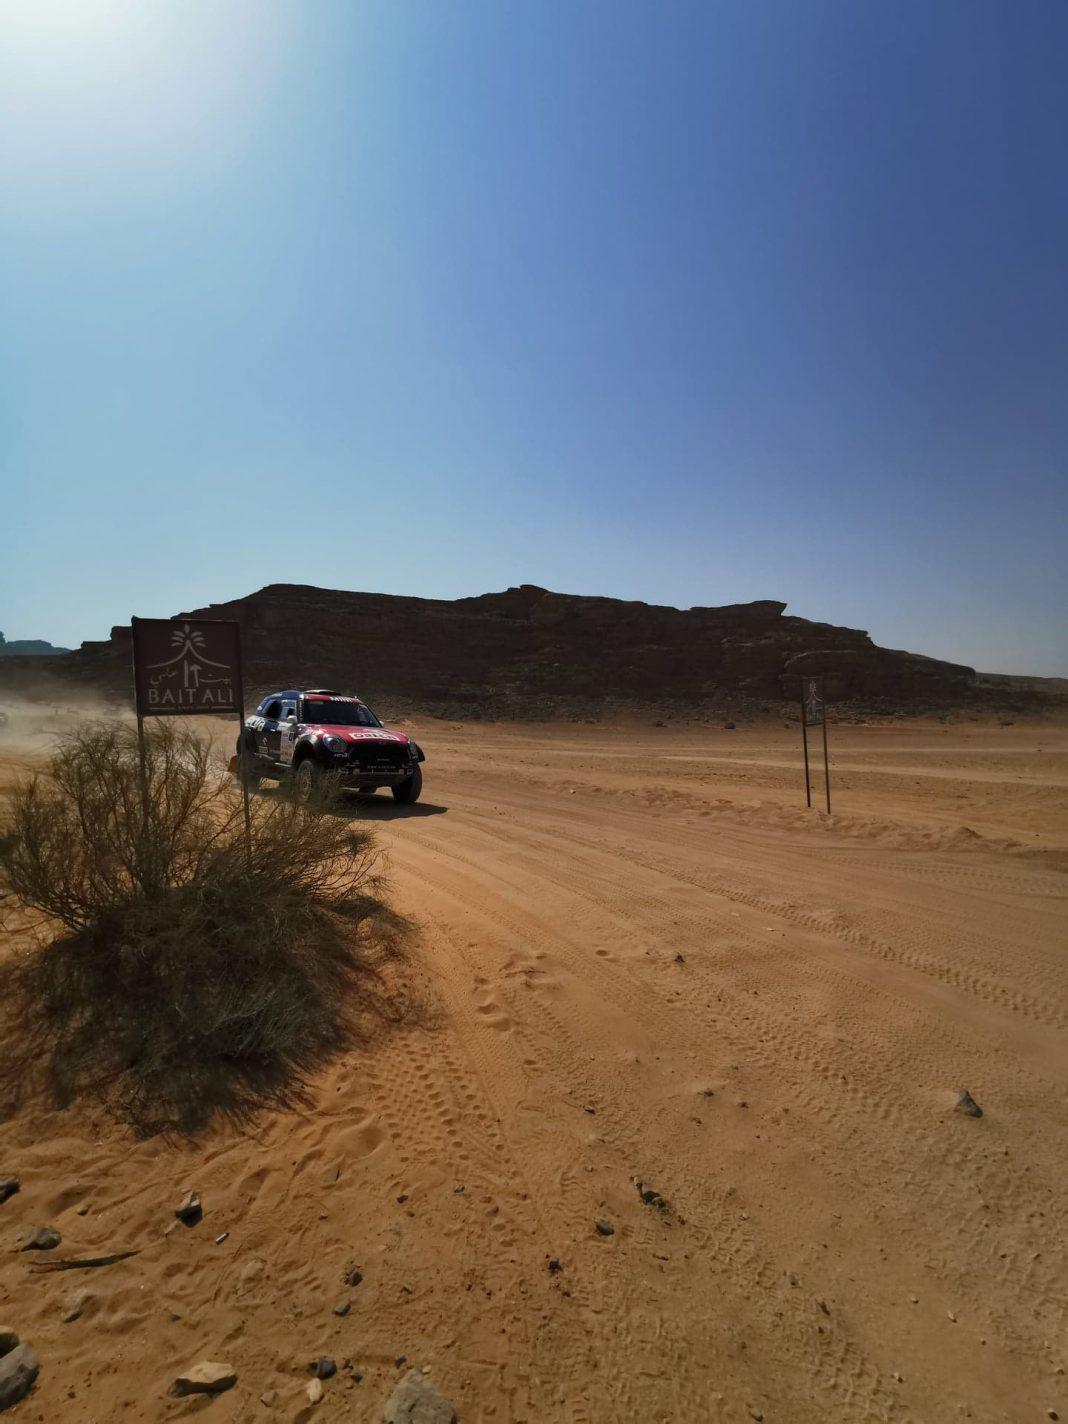 71719394_2392941367634747_8924086470717734912_n-1068x1424 Jakub Przygonski castiga prima editie Jordan Baja